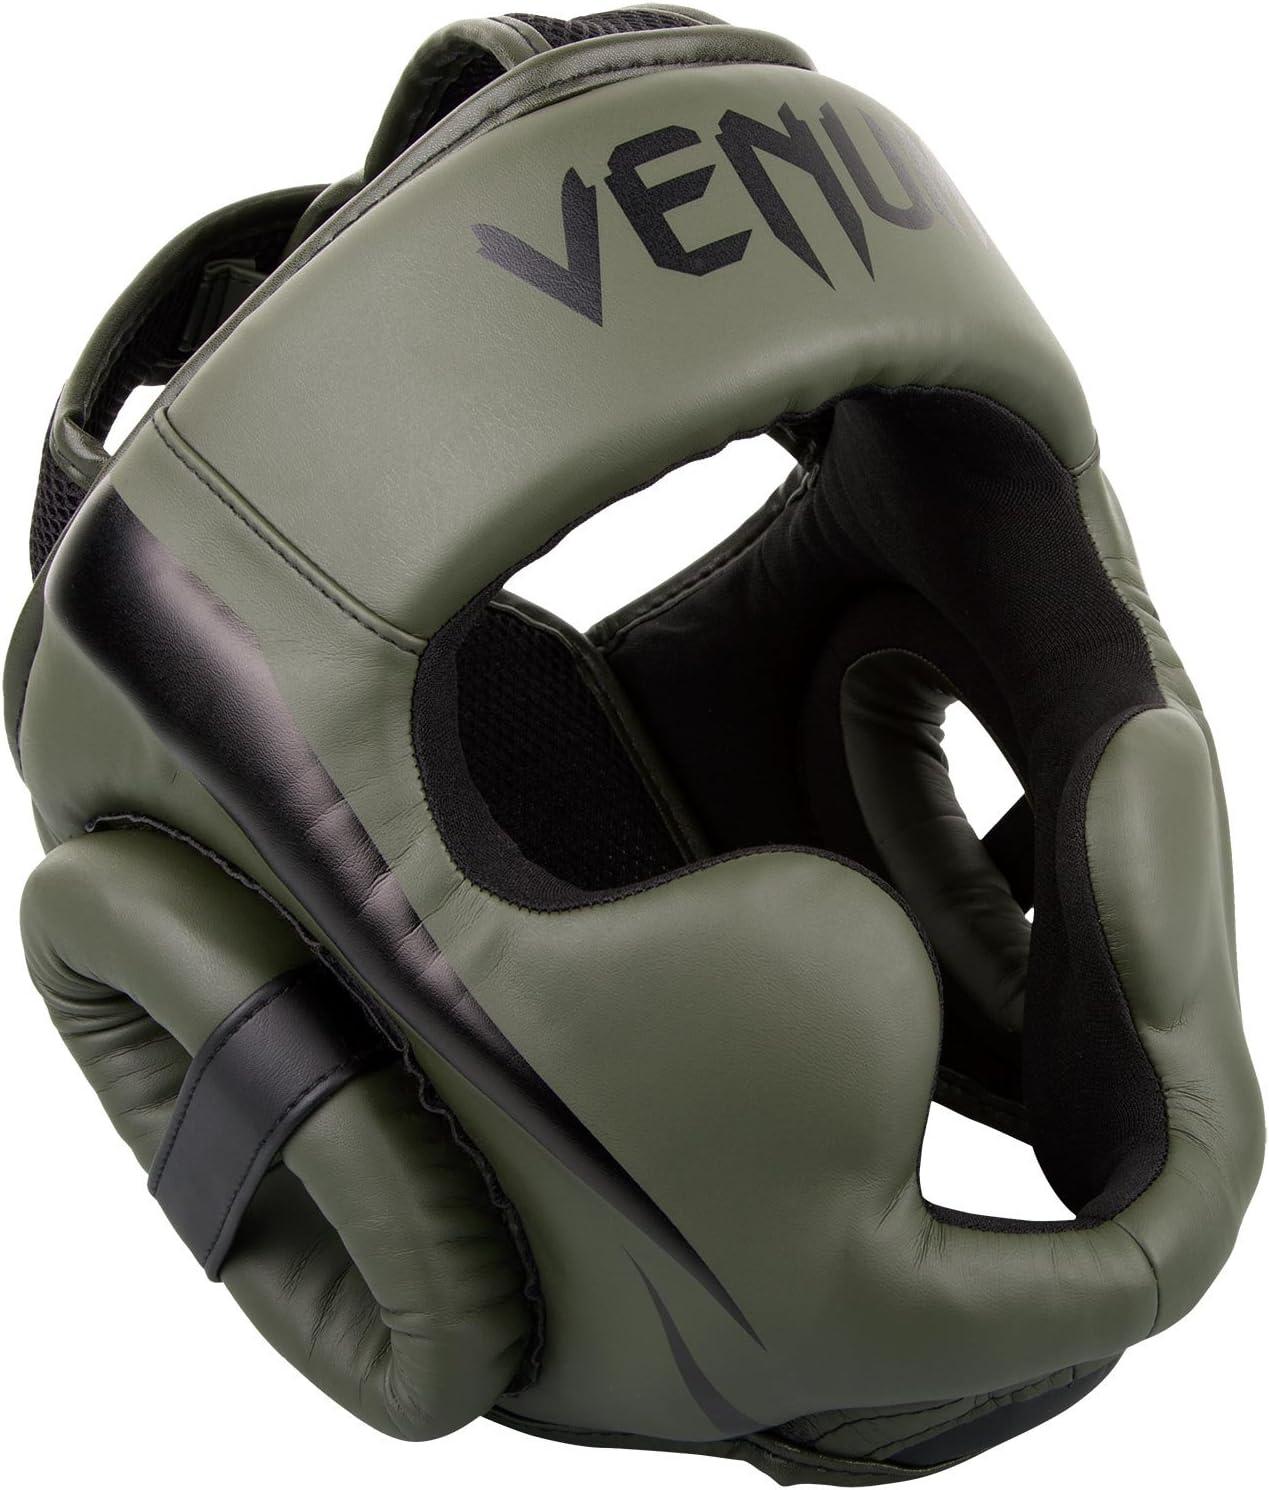 5 ☆ popular Los Angeles Mall Venum Elite Headgear